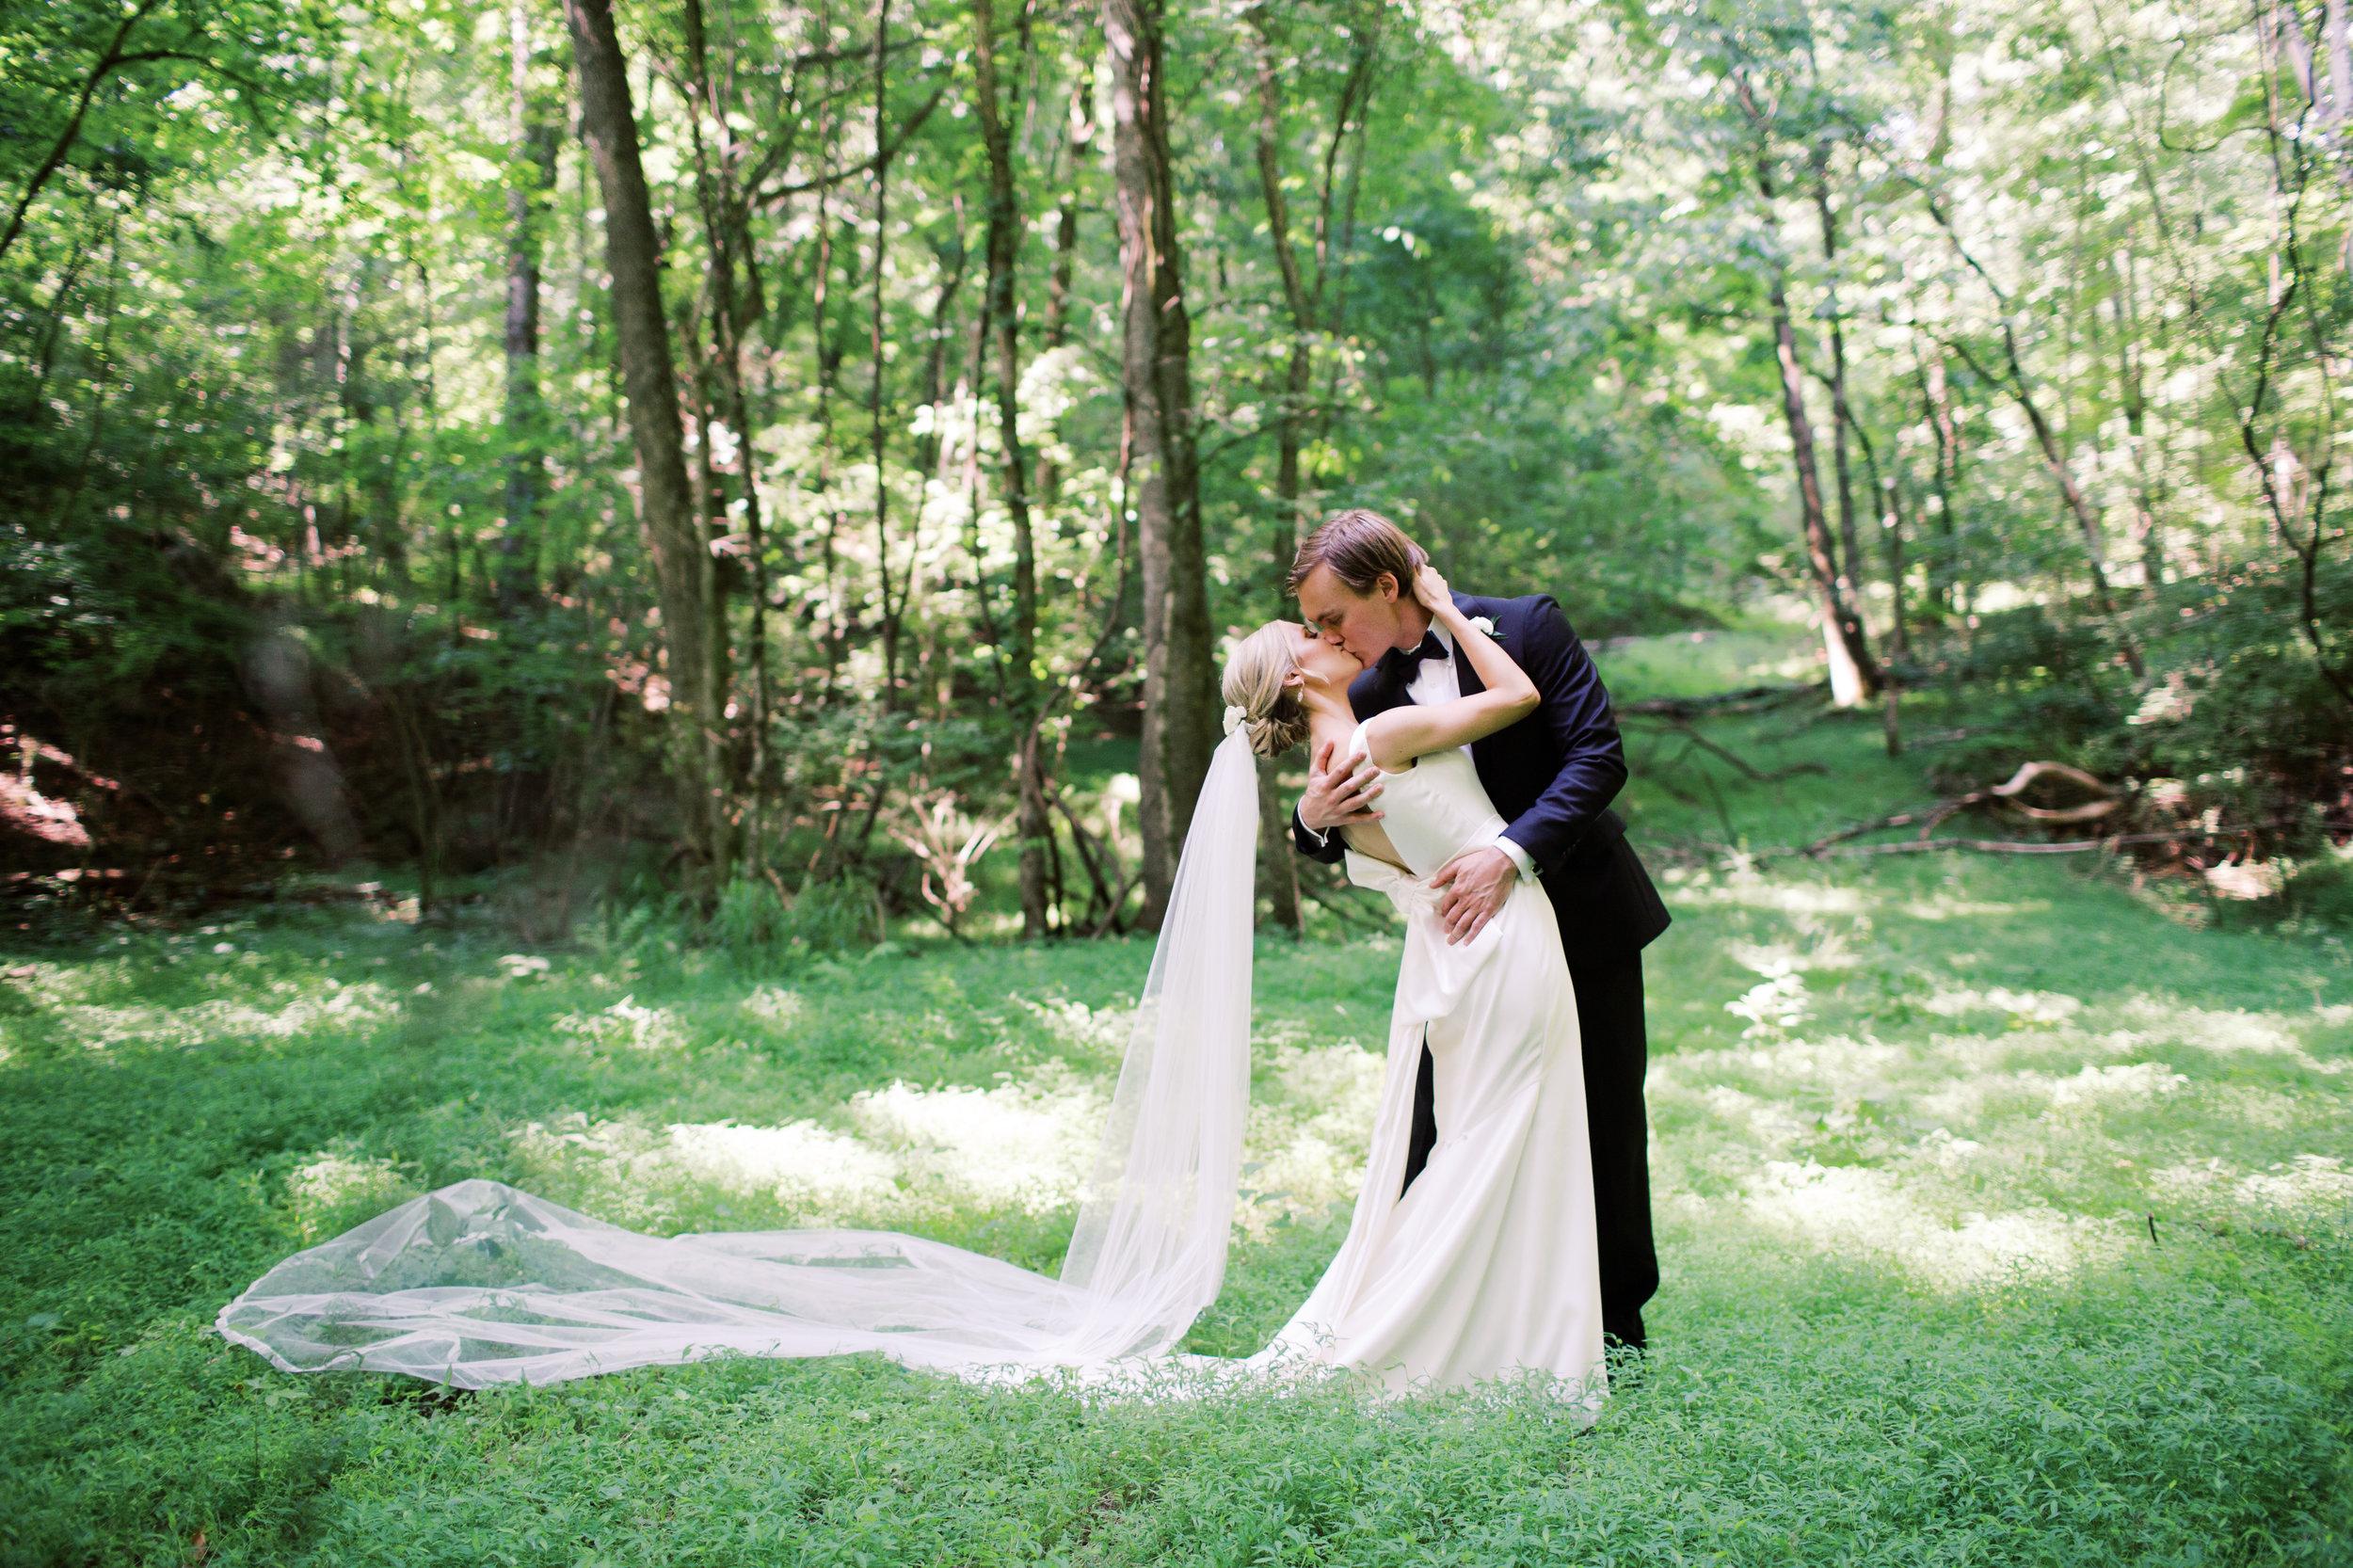 Olivia_Patrick_Wedding_Quarry_Venue_Abigail_Malone_Photography_Knoxville-406.jpg